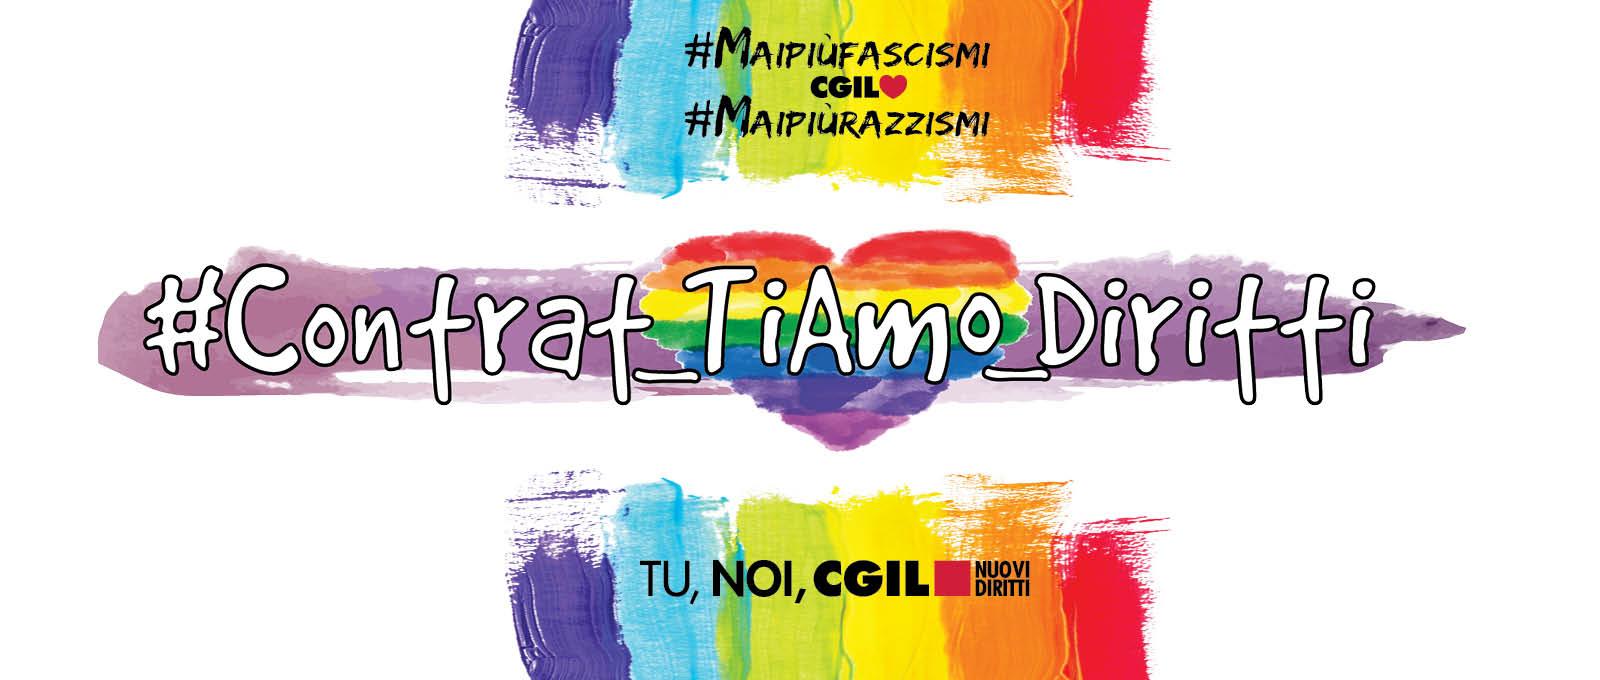 Oggi  i  Pride a Roma, Pavia, Trieste, Messina e Ancona